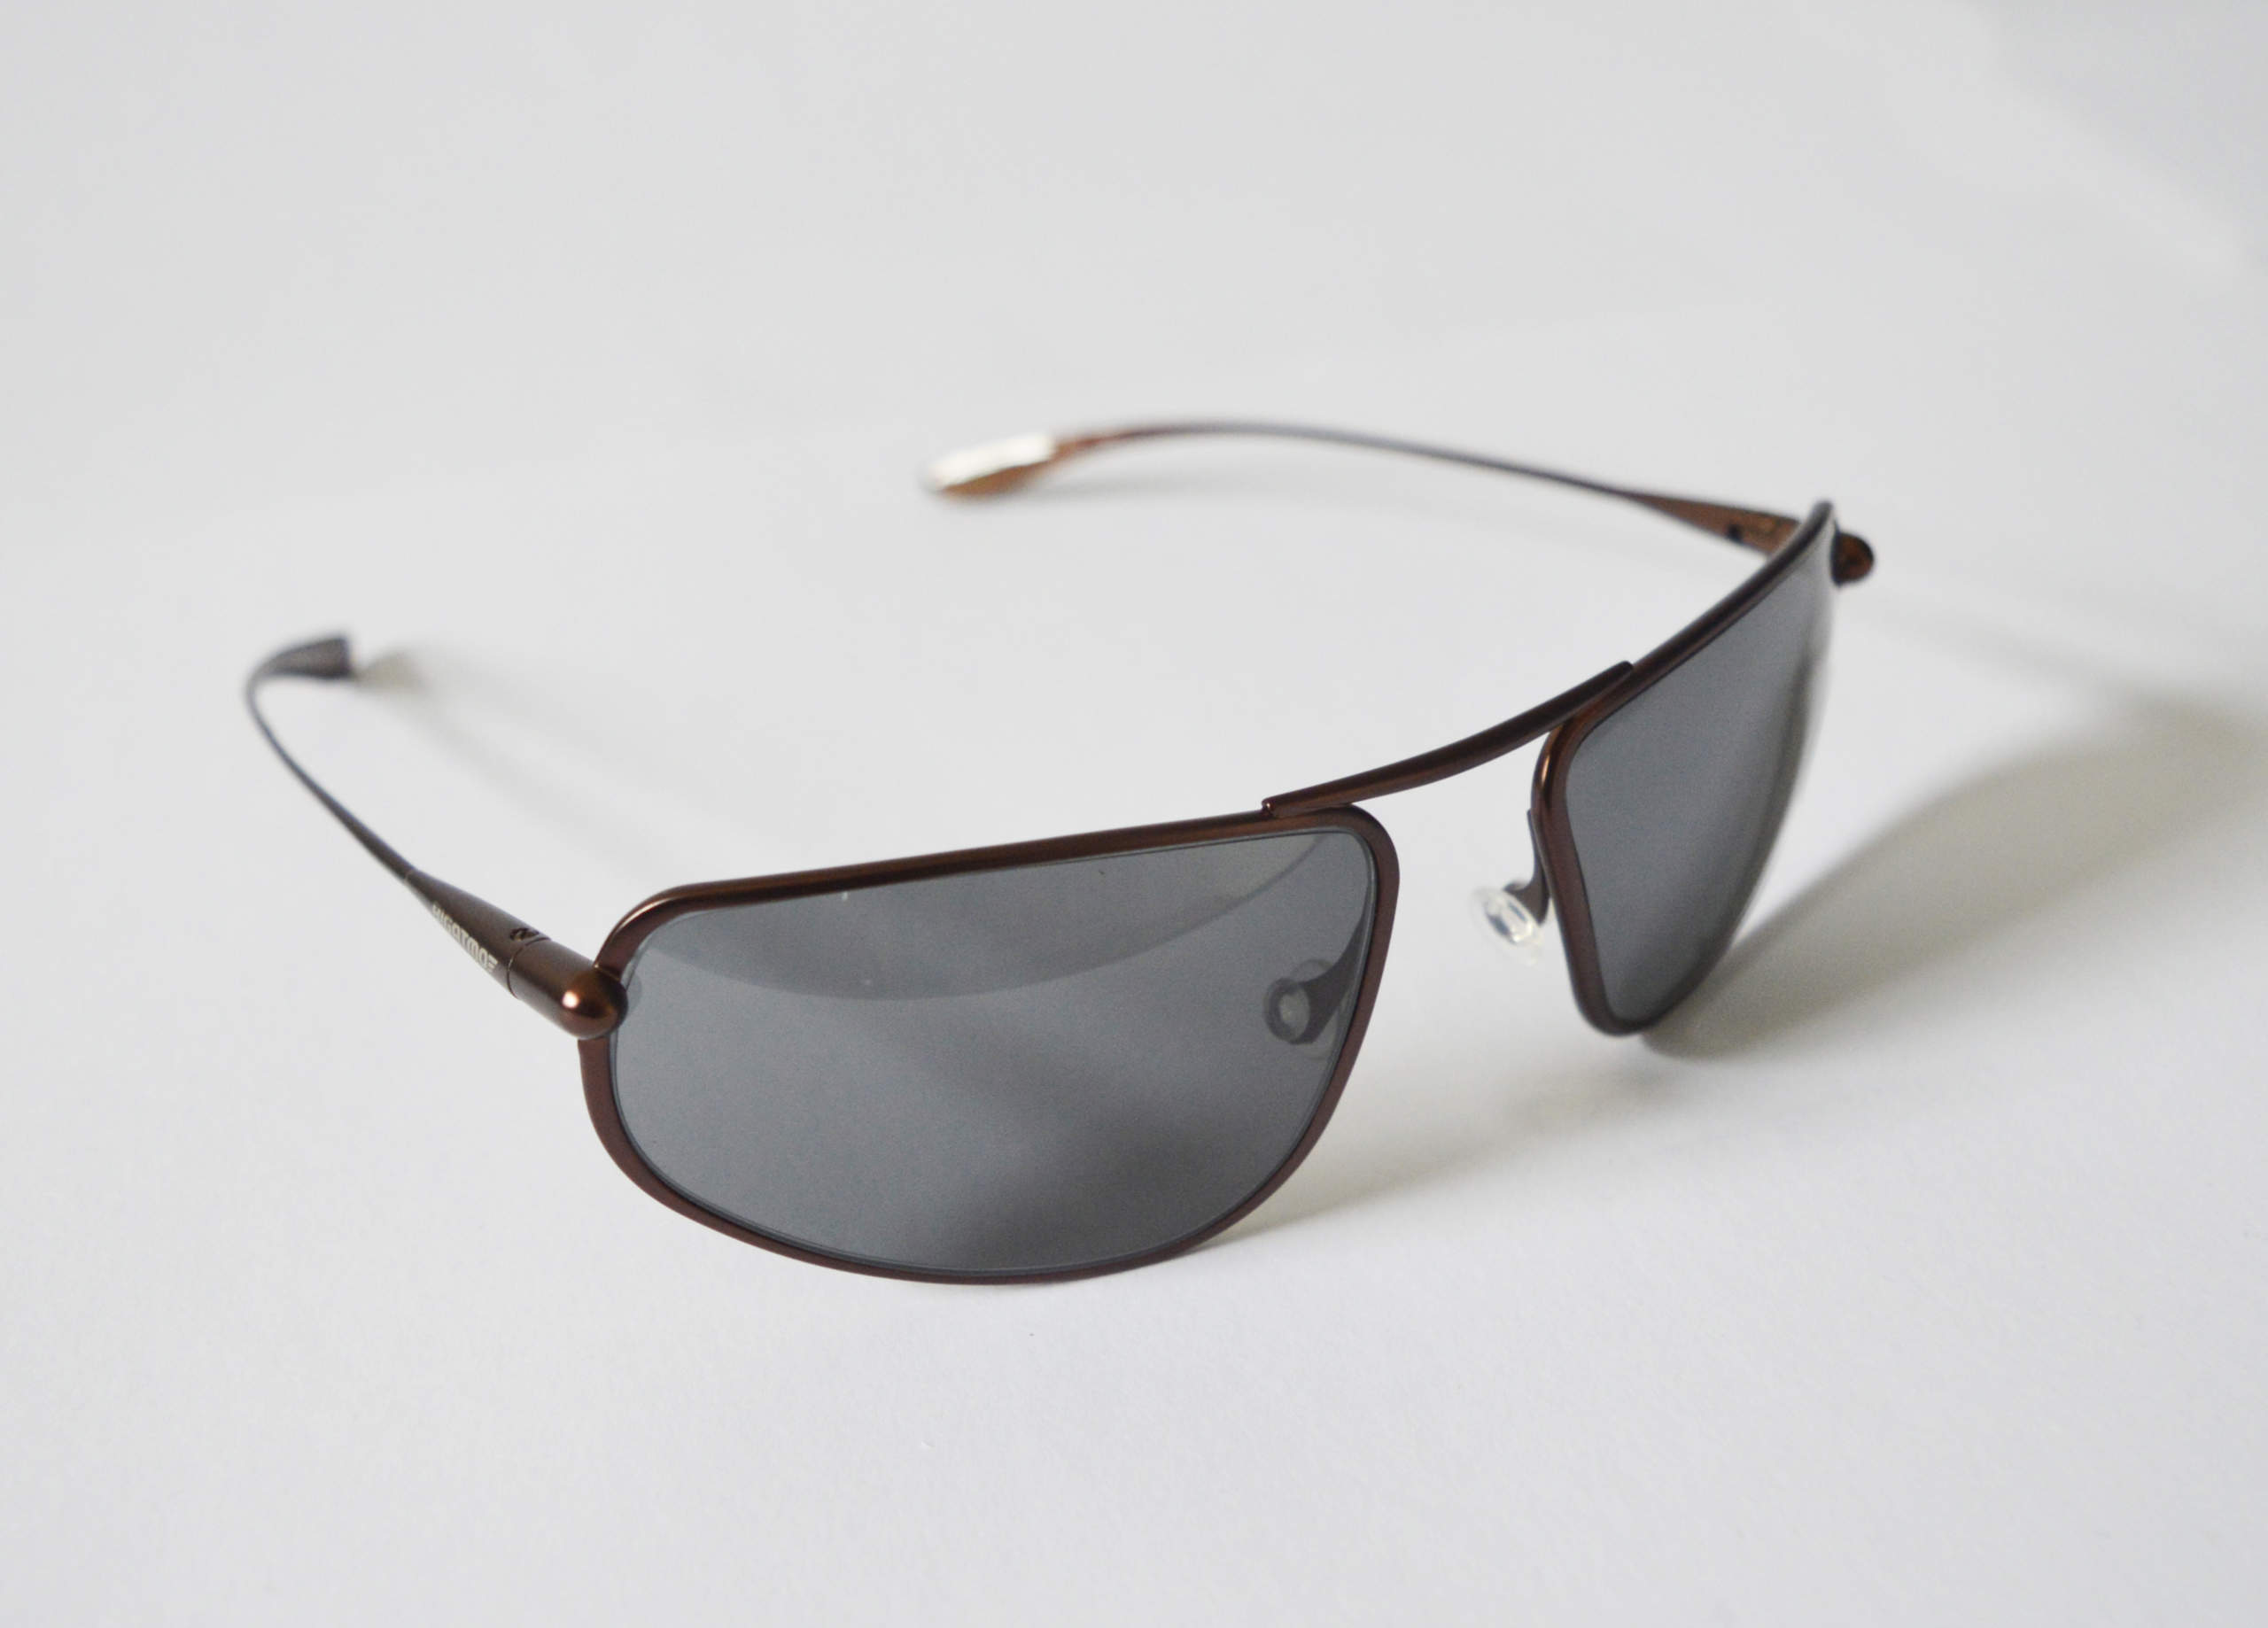 Strato - Brunello Titanium Frame High-Contrast Sunglasses